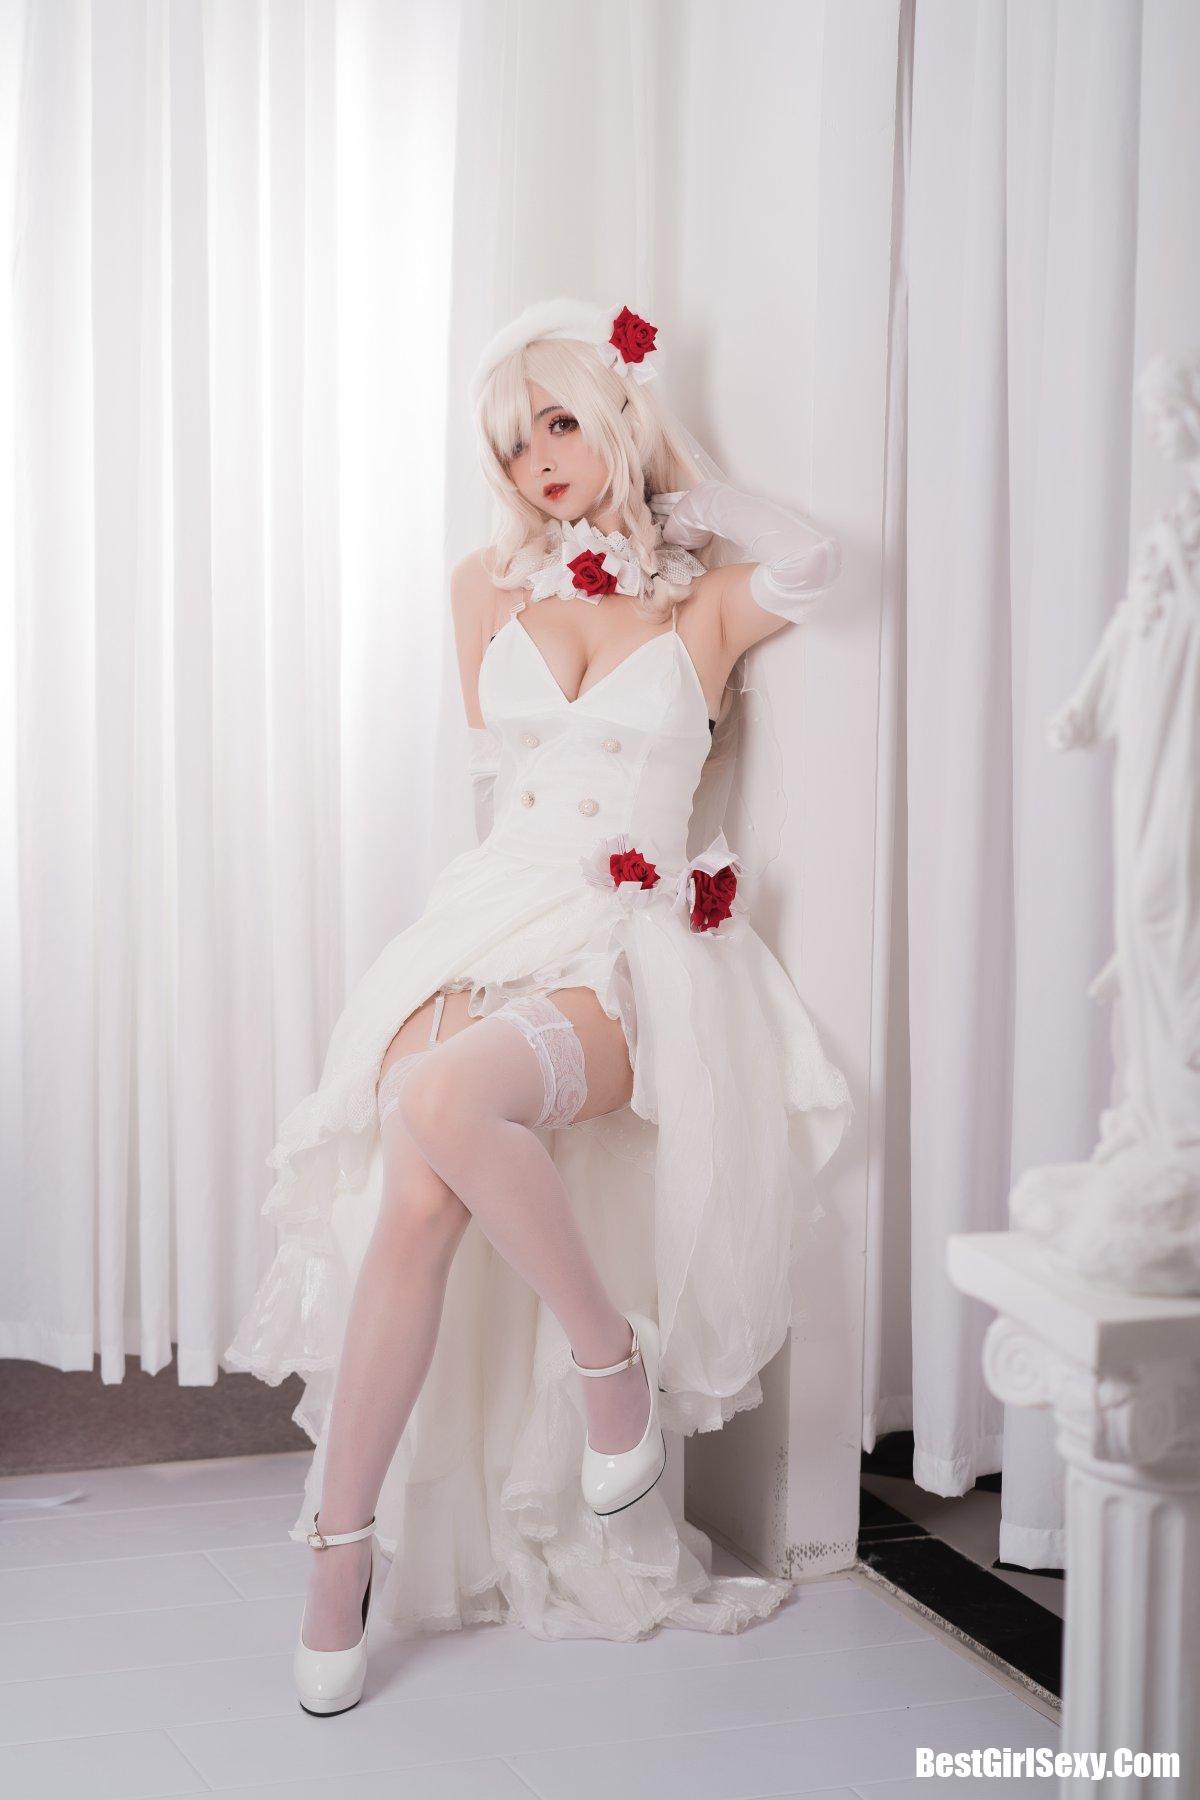 rioko凉凉子, G36c花嫁, Coser@rioko凉凉子 Vol.001 G36c花嫁